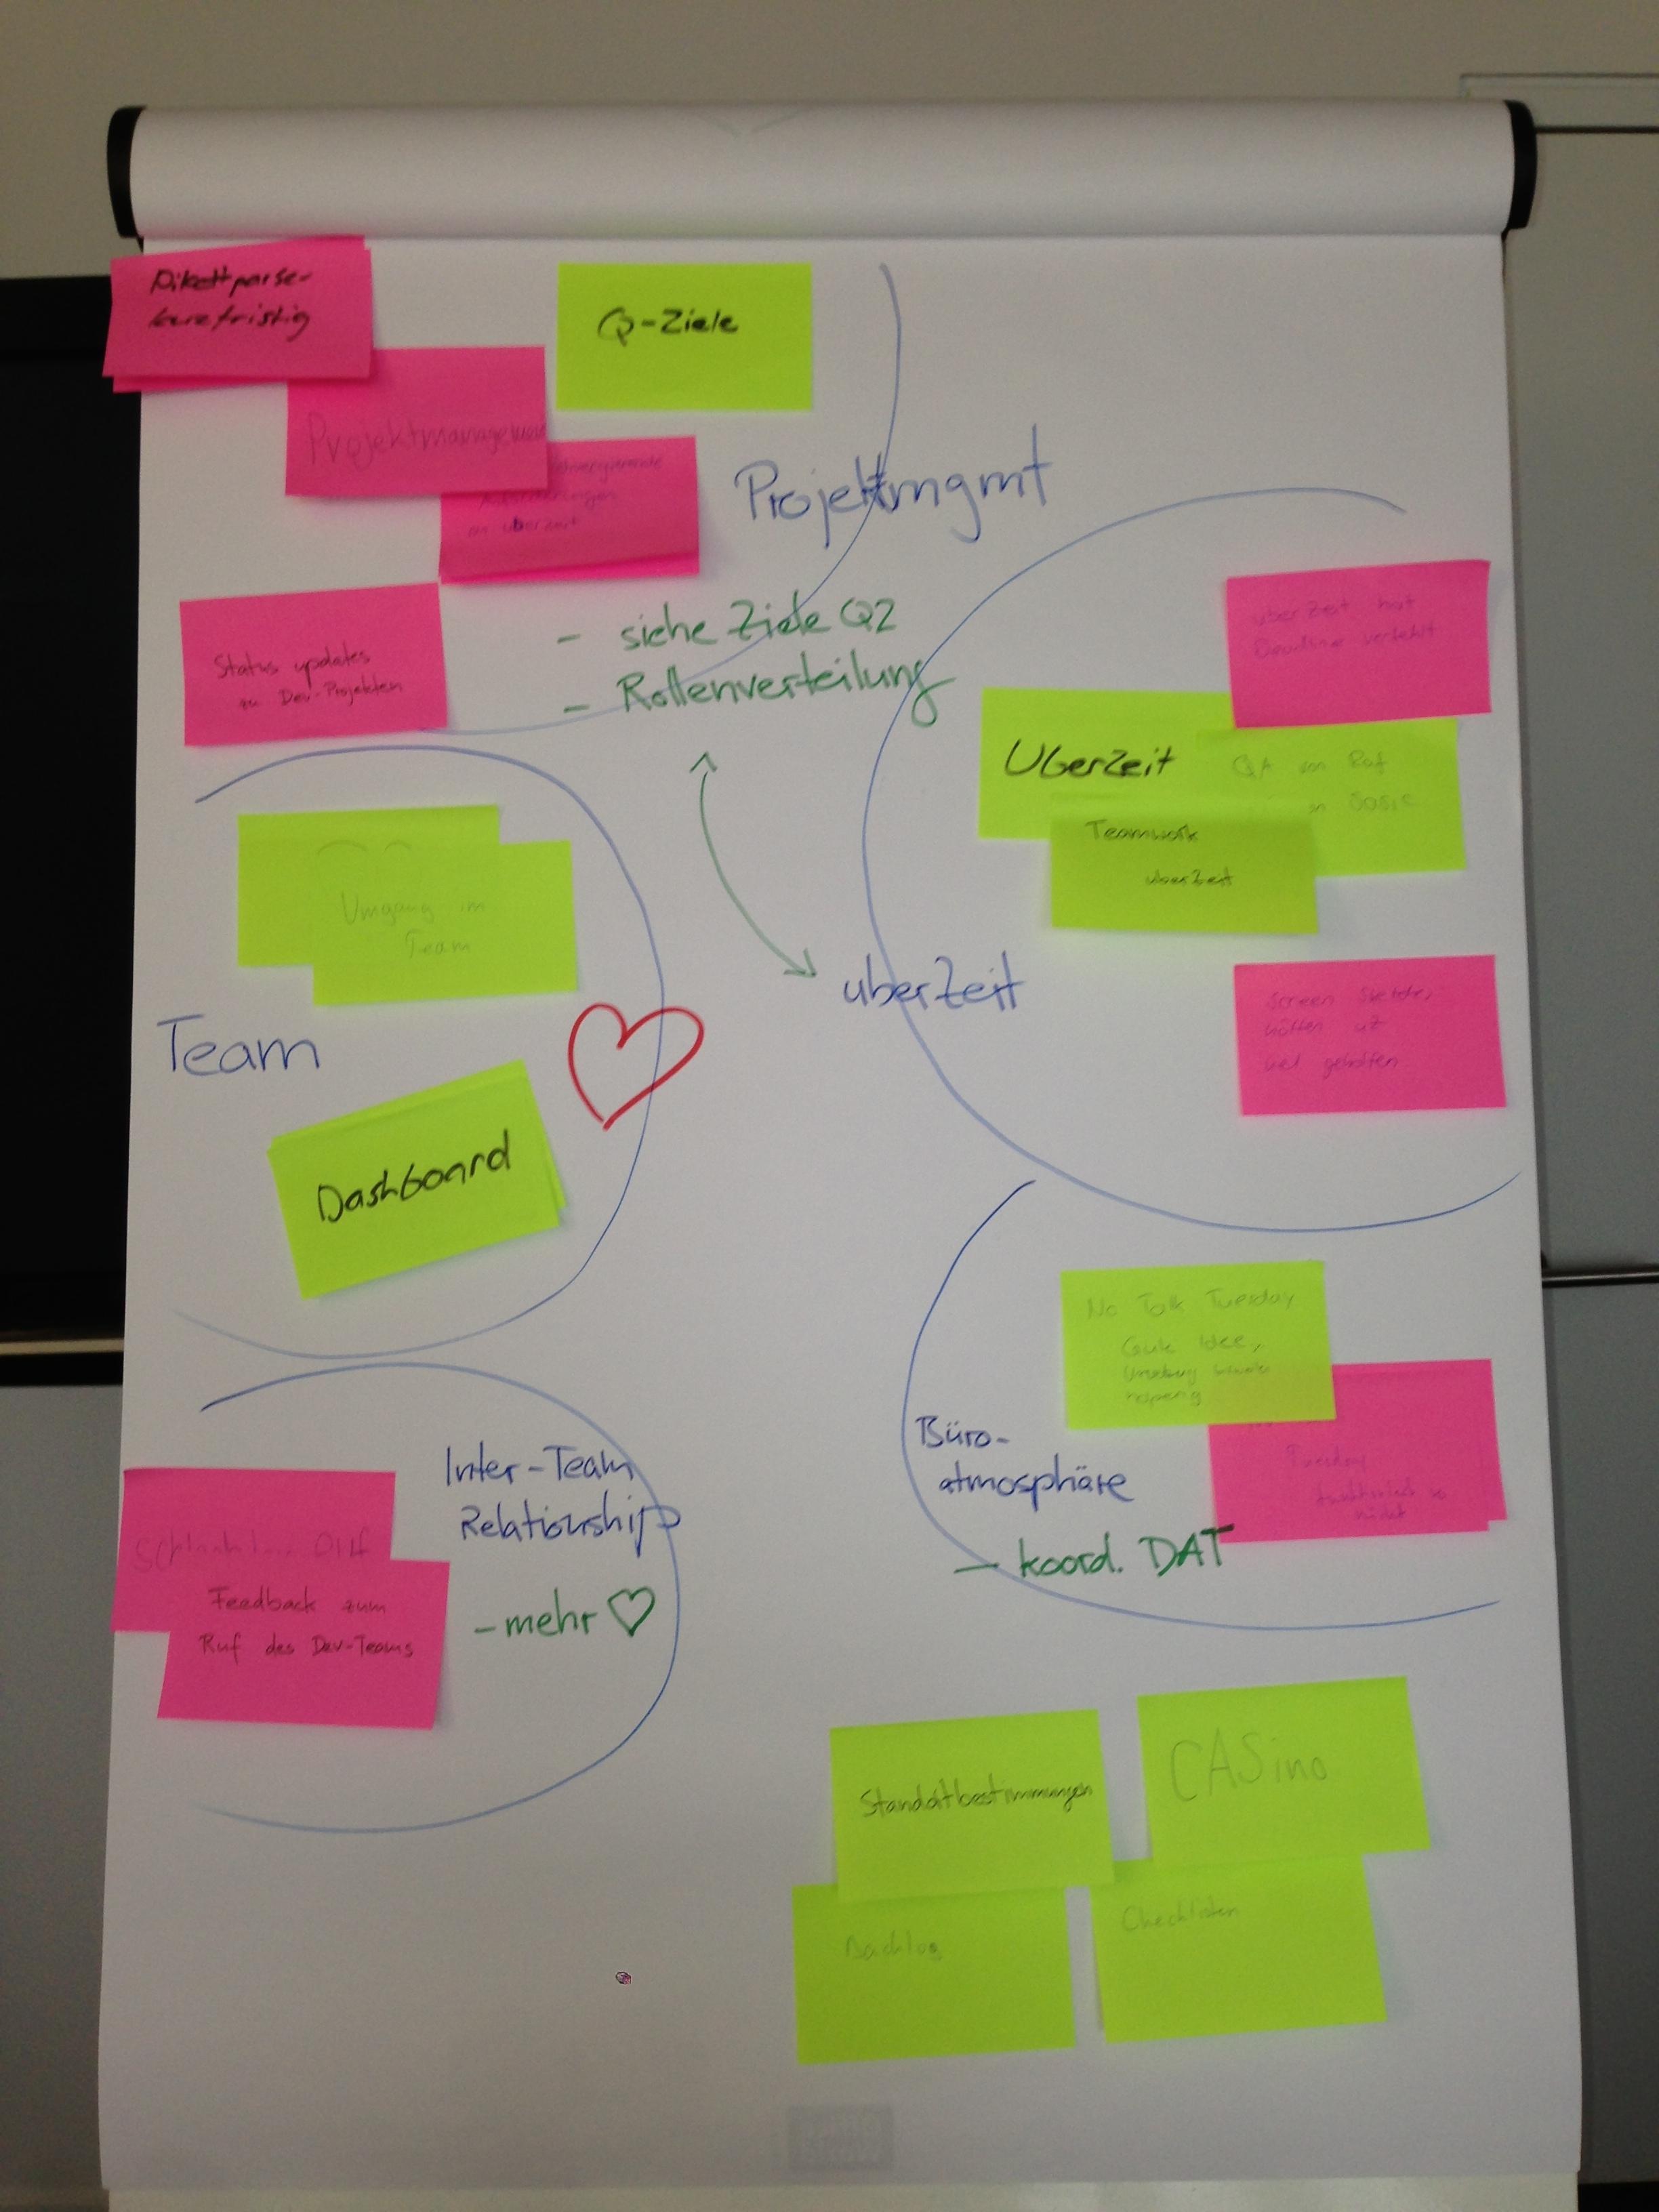 Clustered sticky notes after a team retrospective